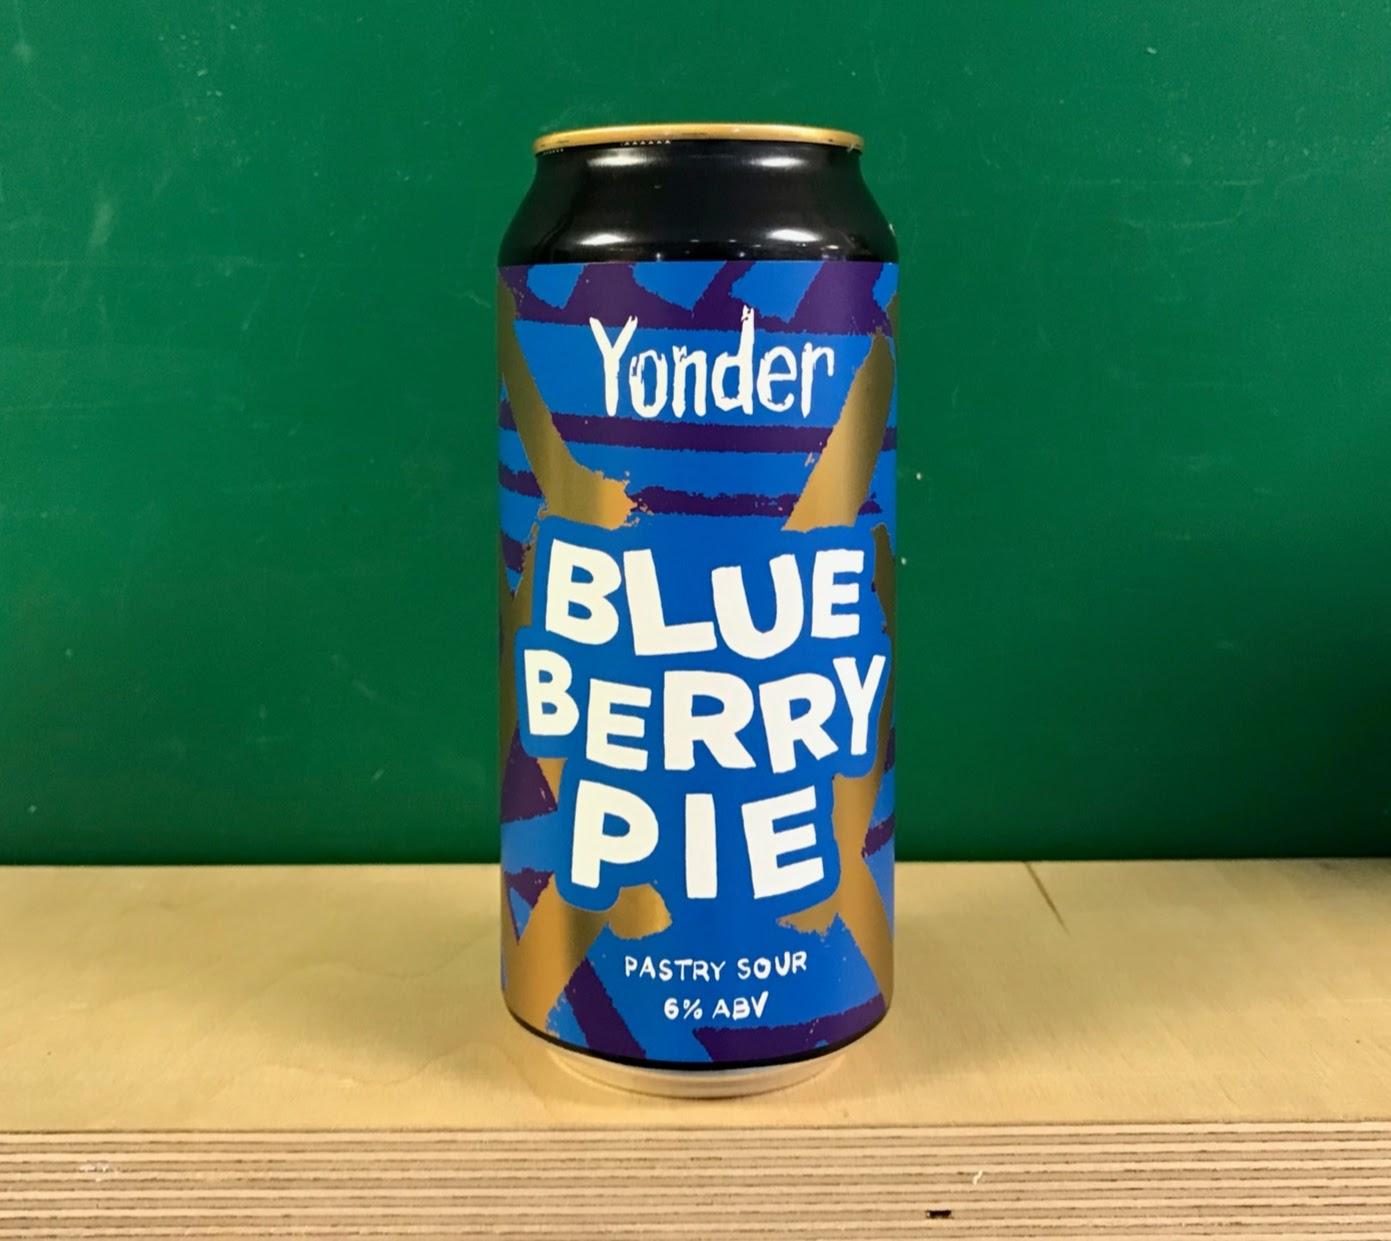 Yonder Blueberry Pie